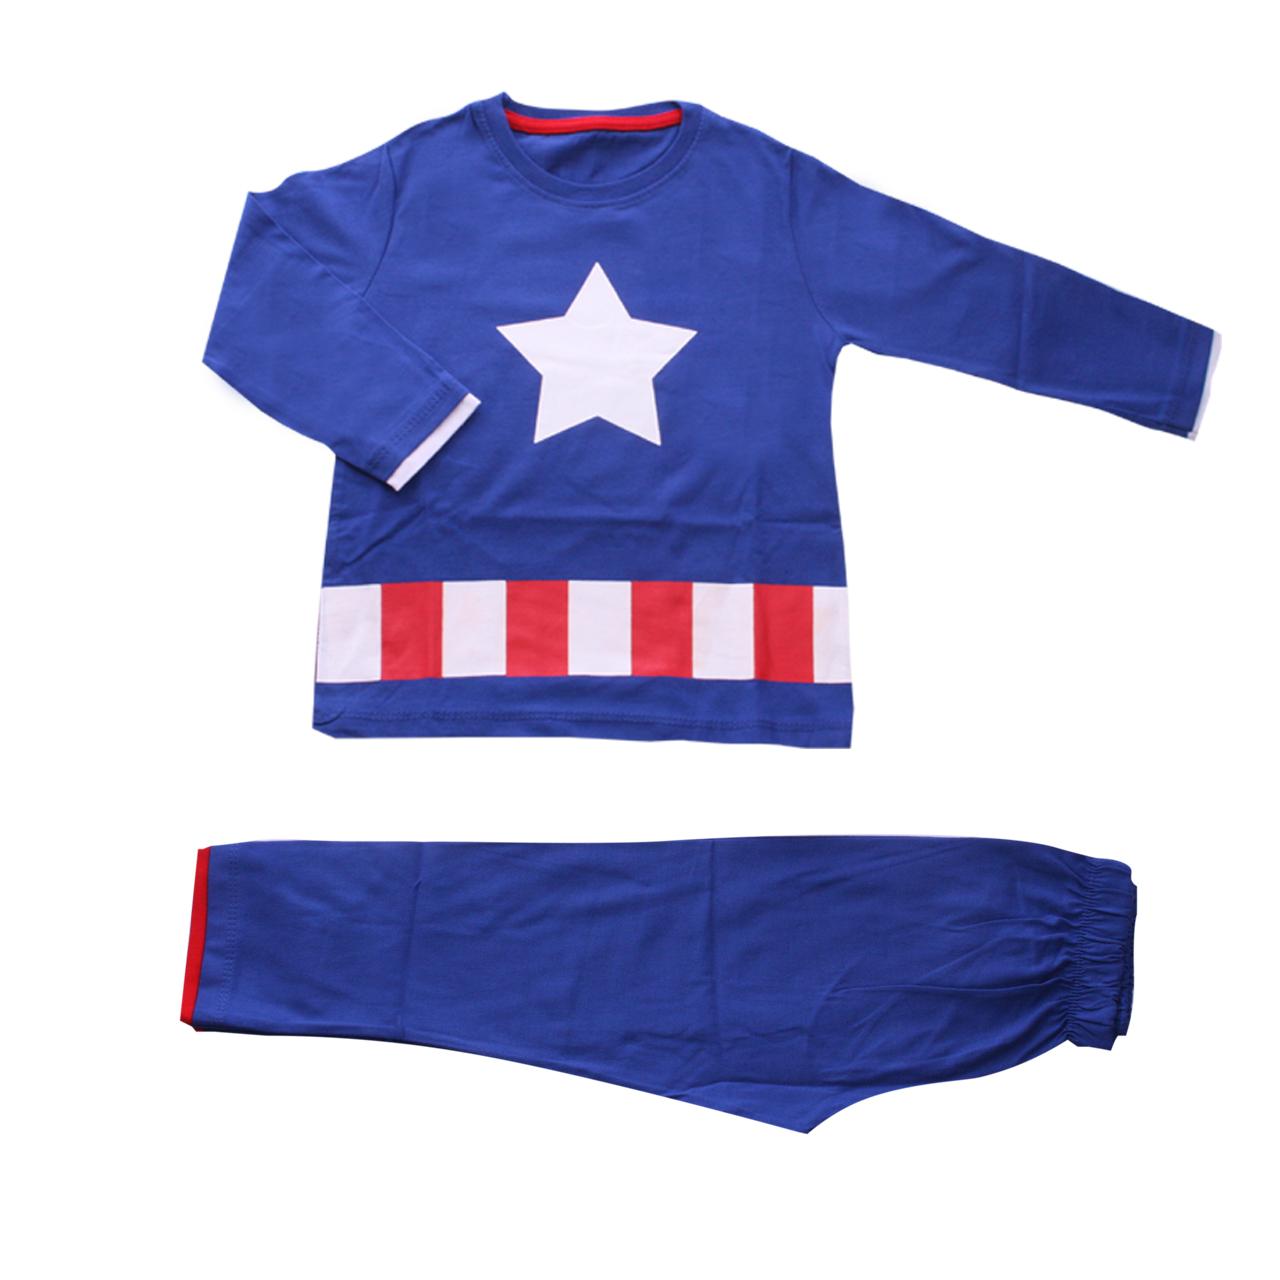 ست لباس پسرانه وچیون طرح کاپیتان امریکا مدل Captain00